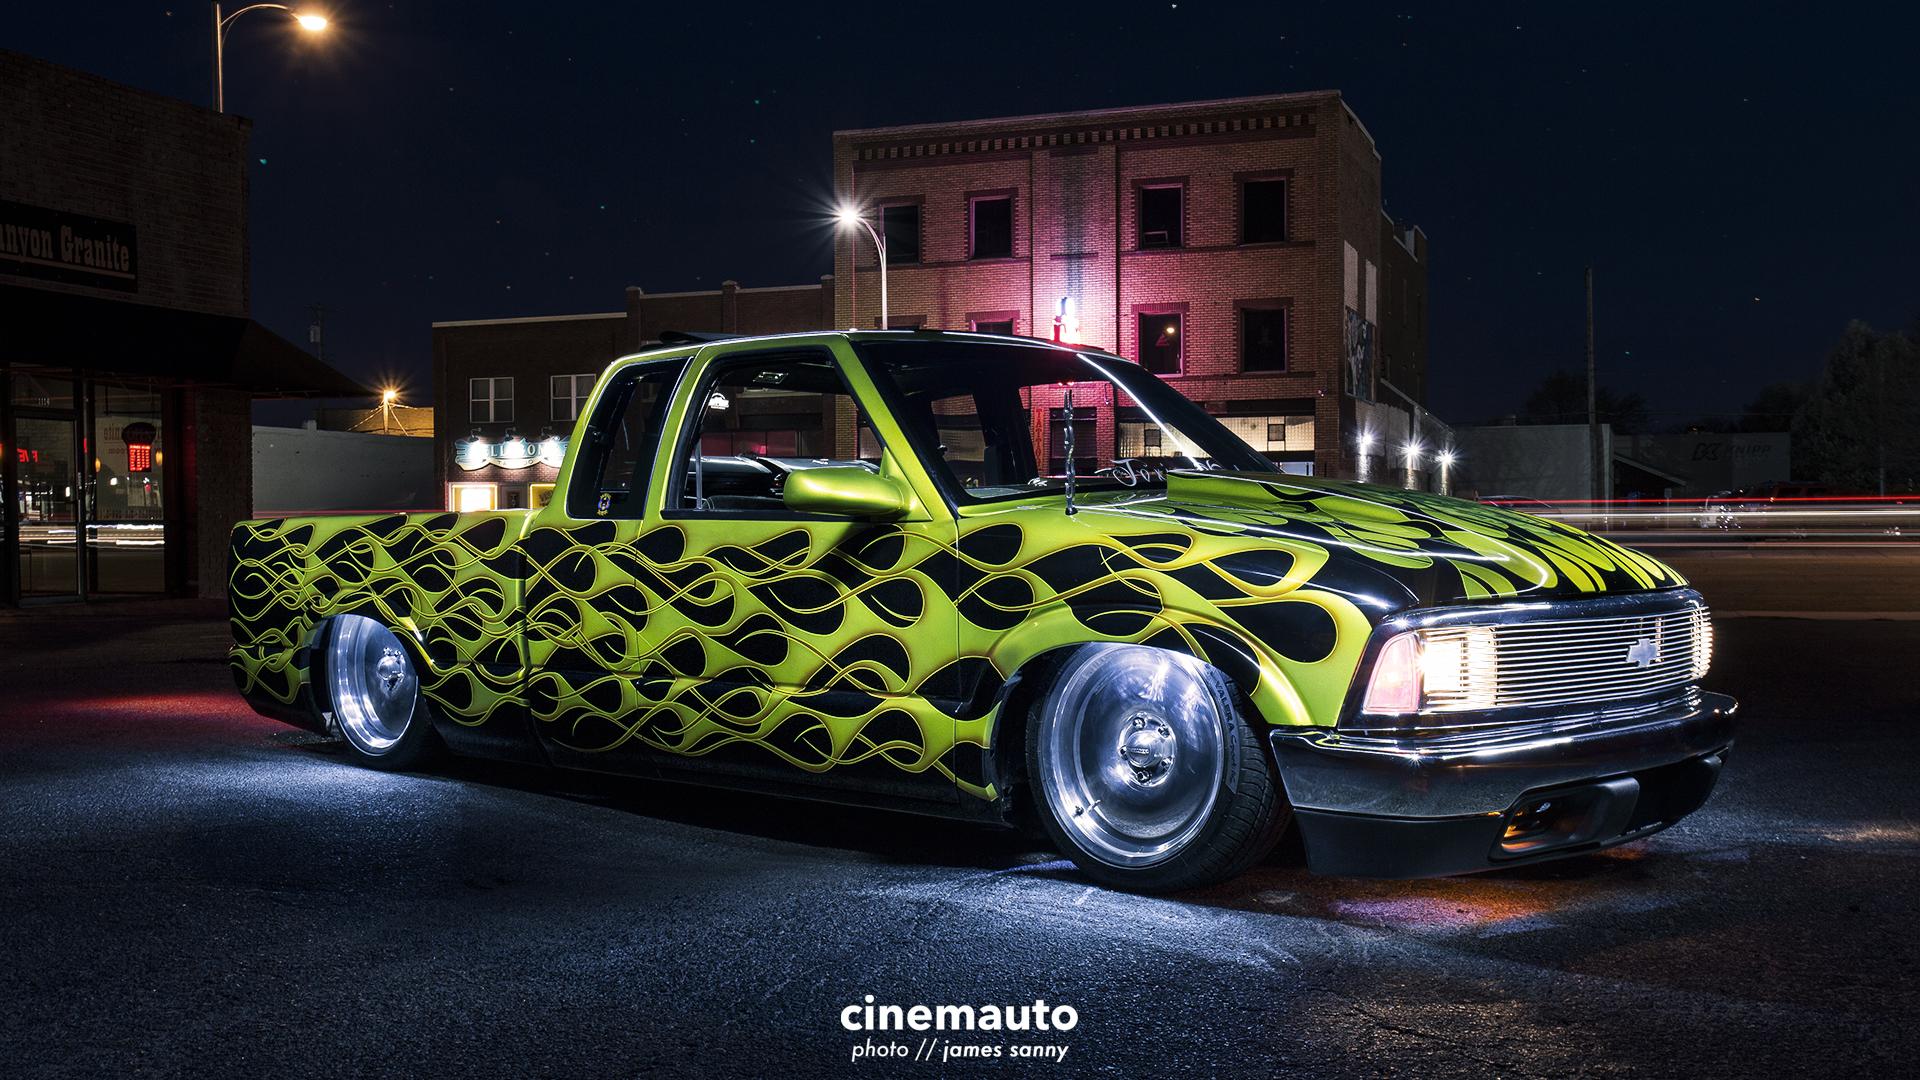 cinemauto-wichita-automotive-photographer-james-sanny-Xsm.jpg